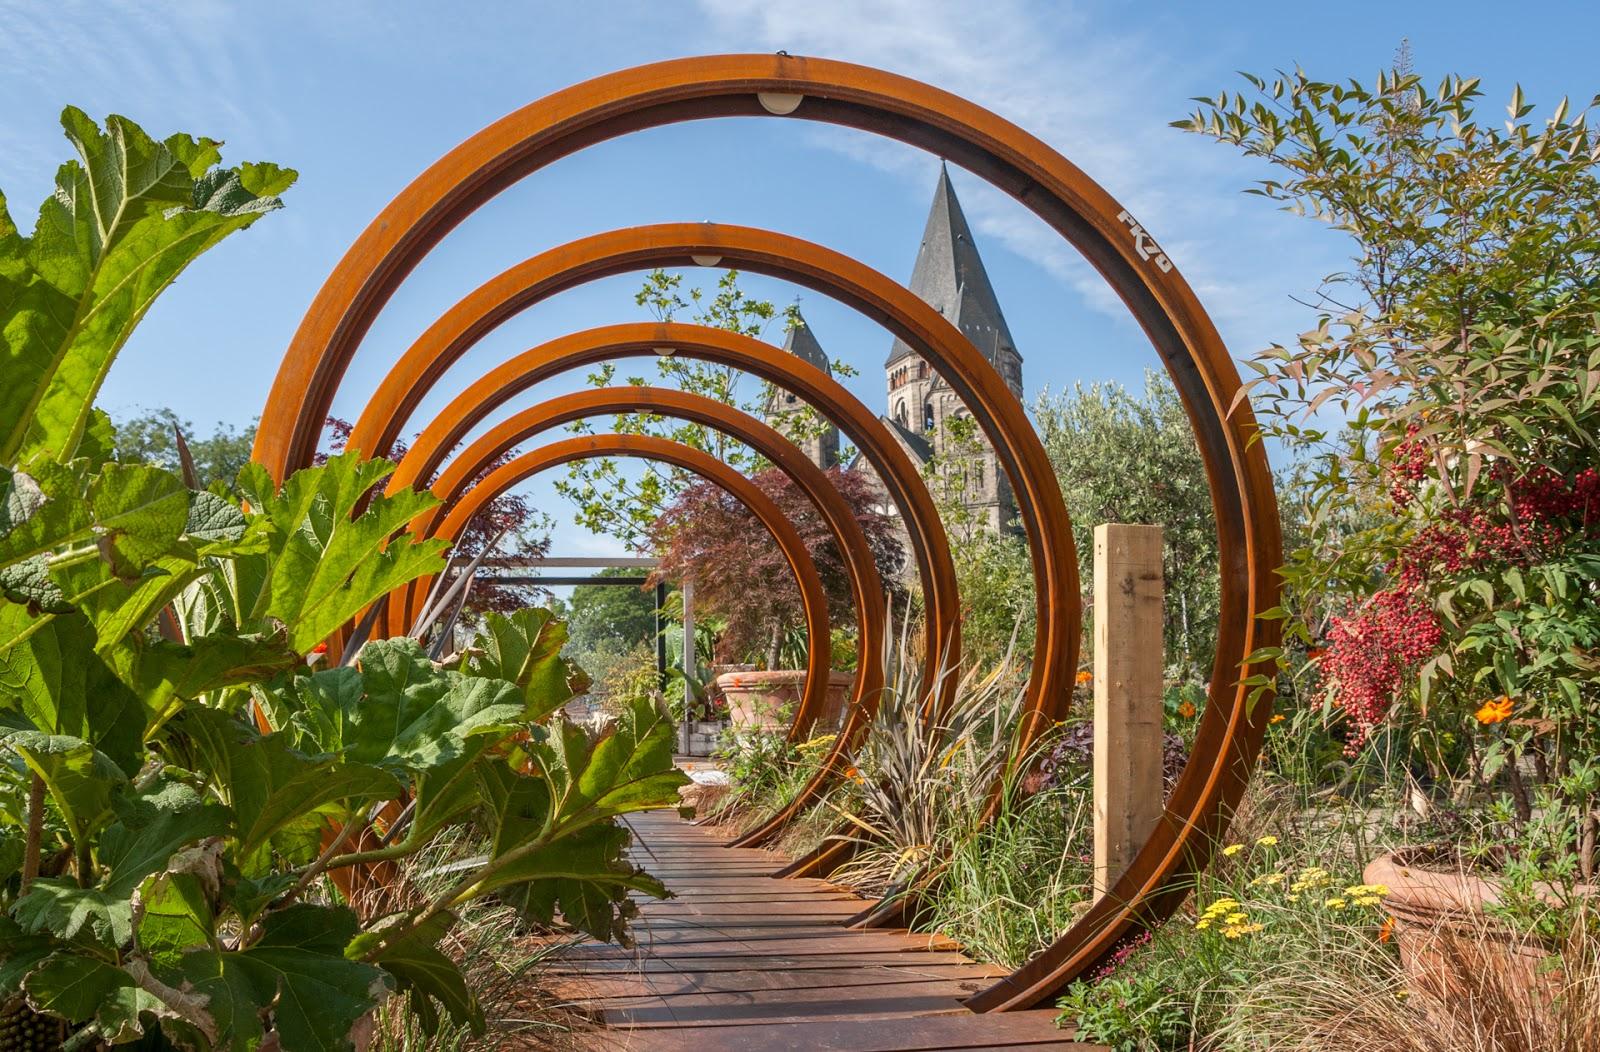 Une promenade à Metz, côté jardin